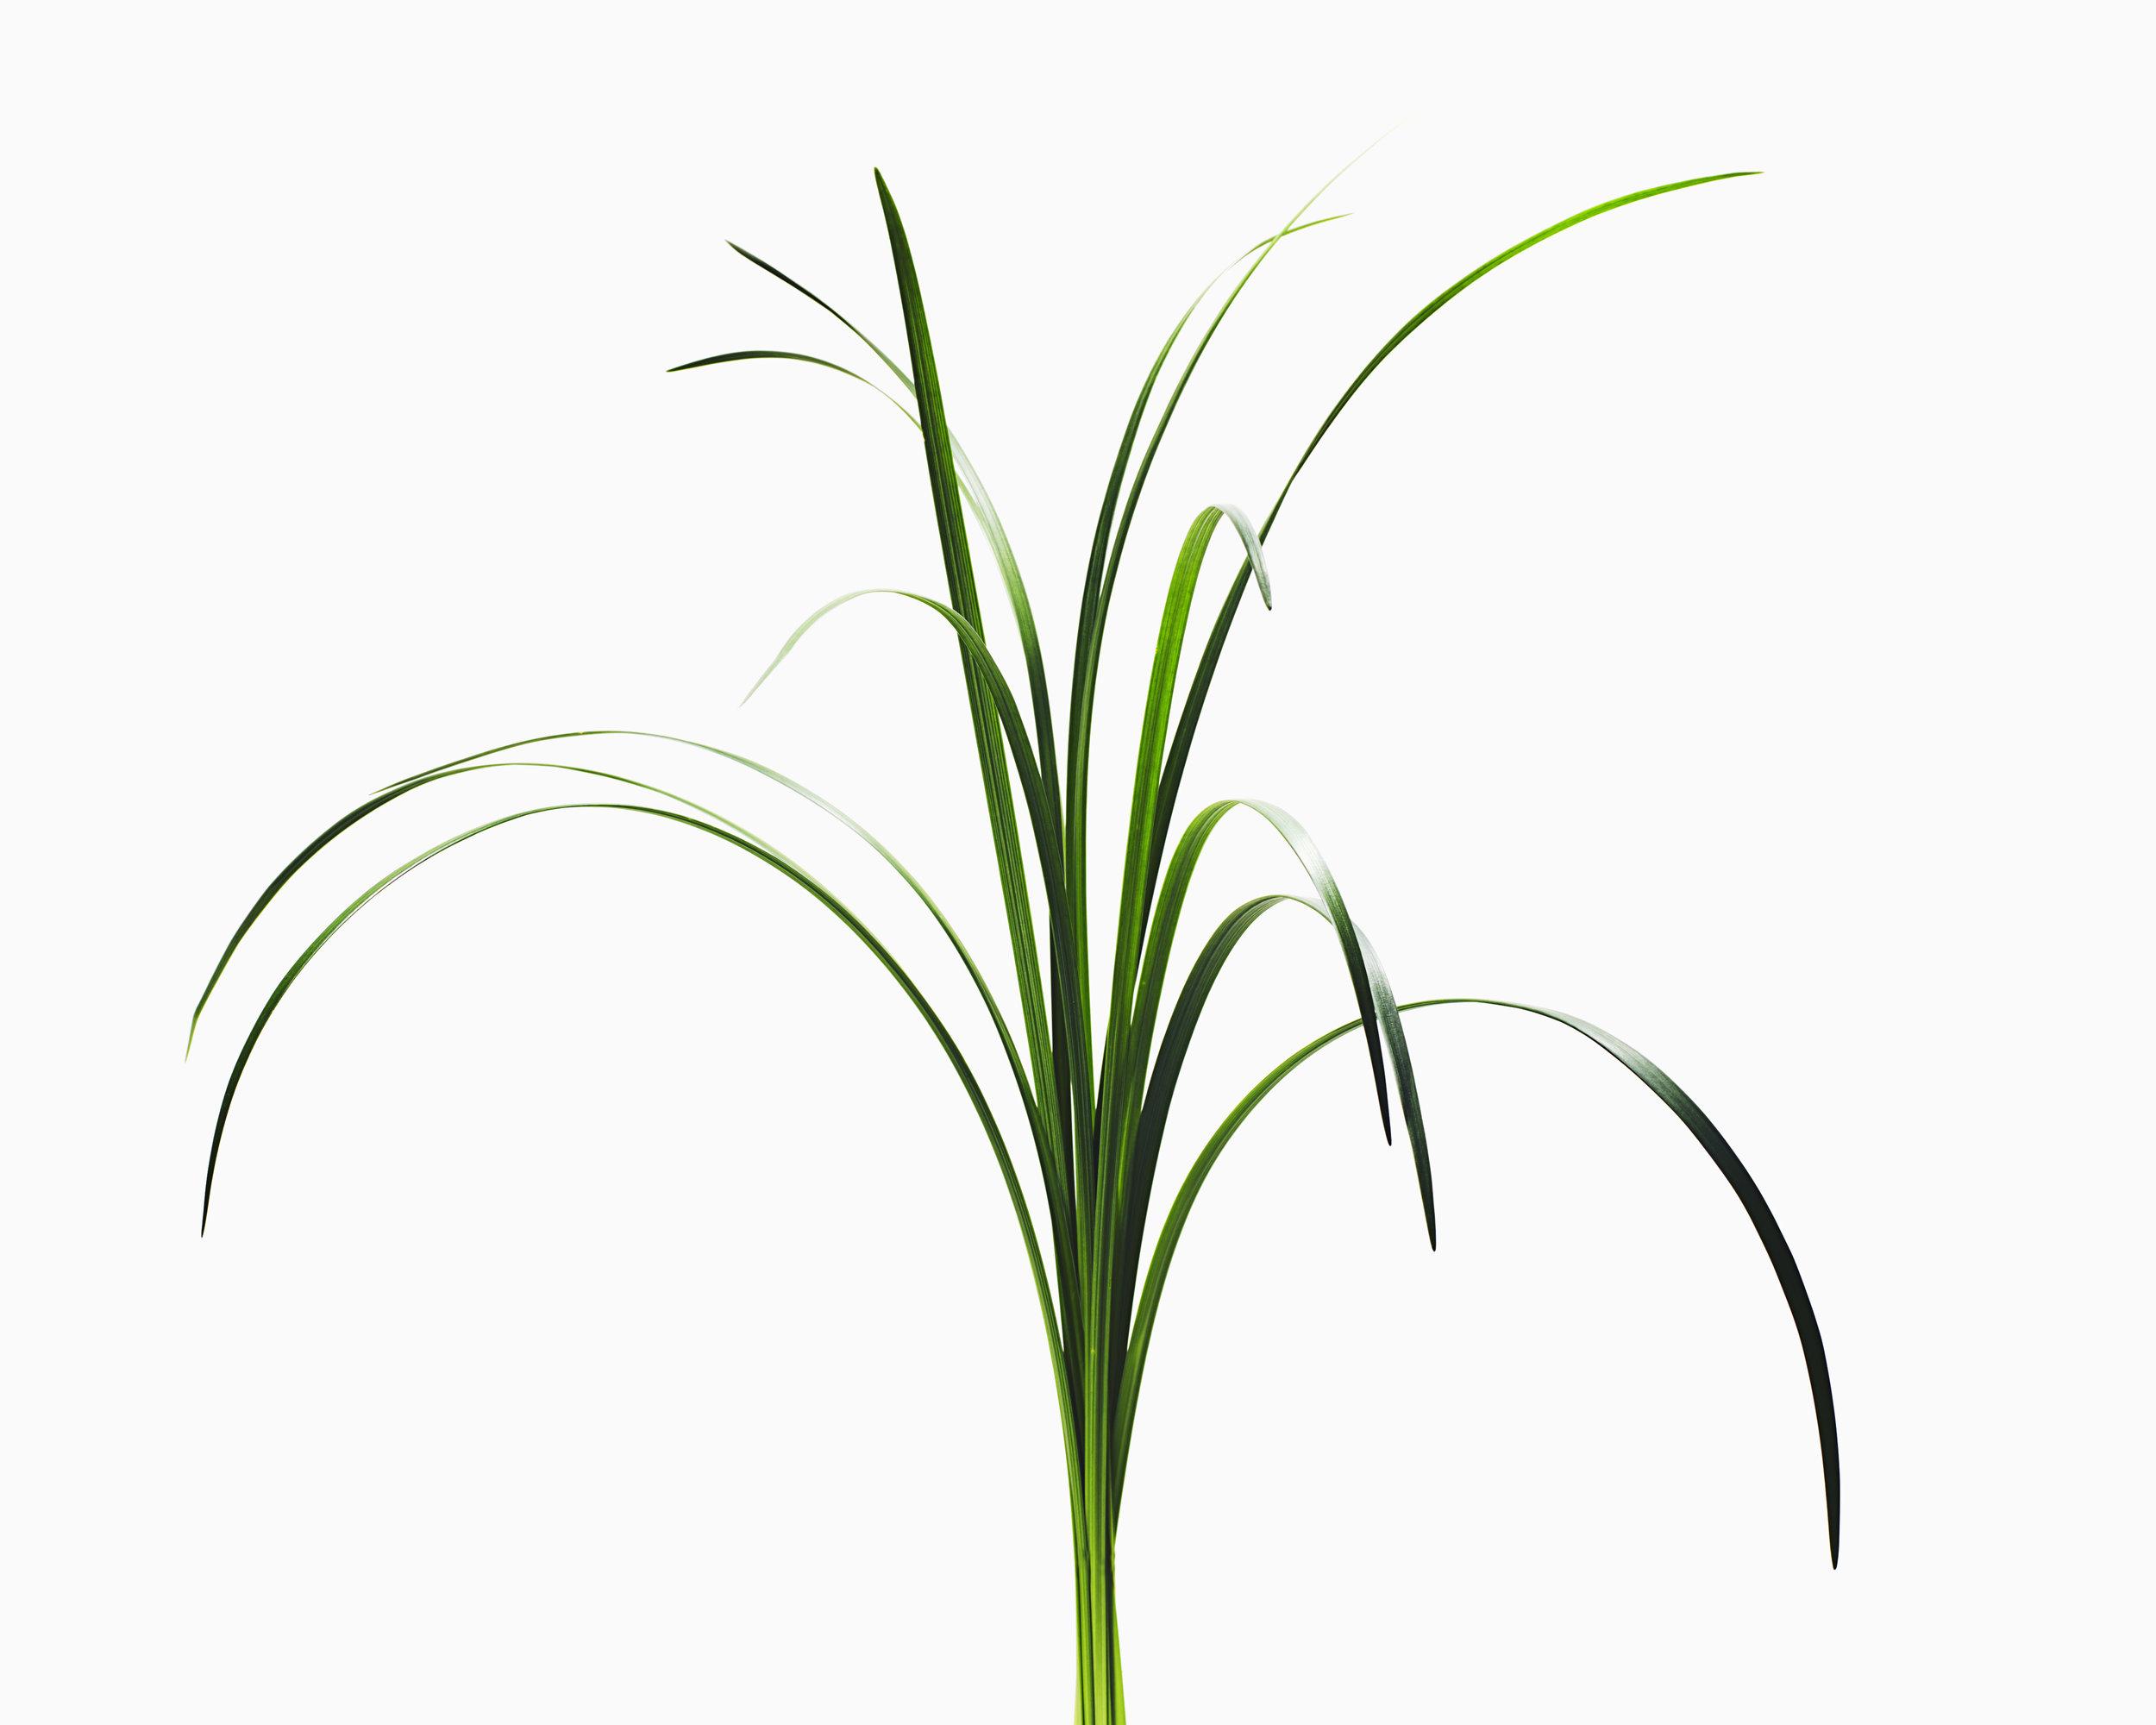 061918_Plants_1854.jpg